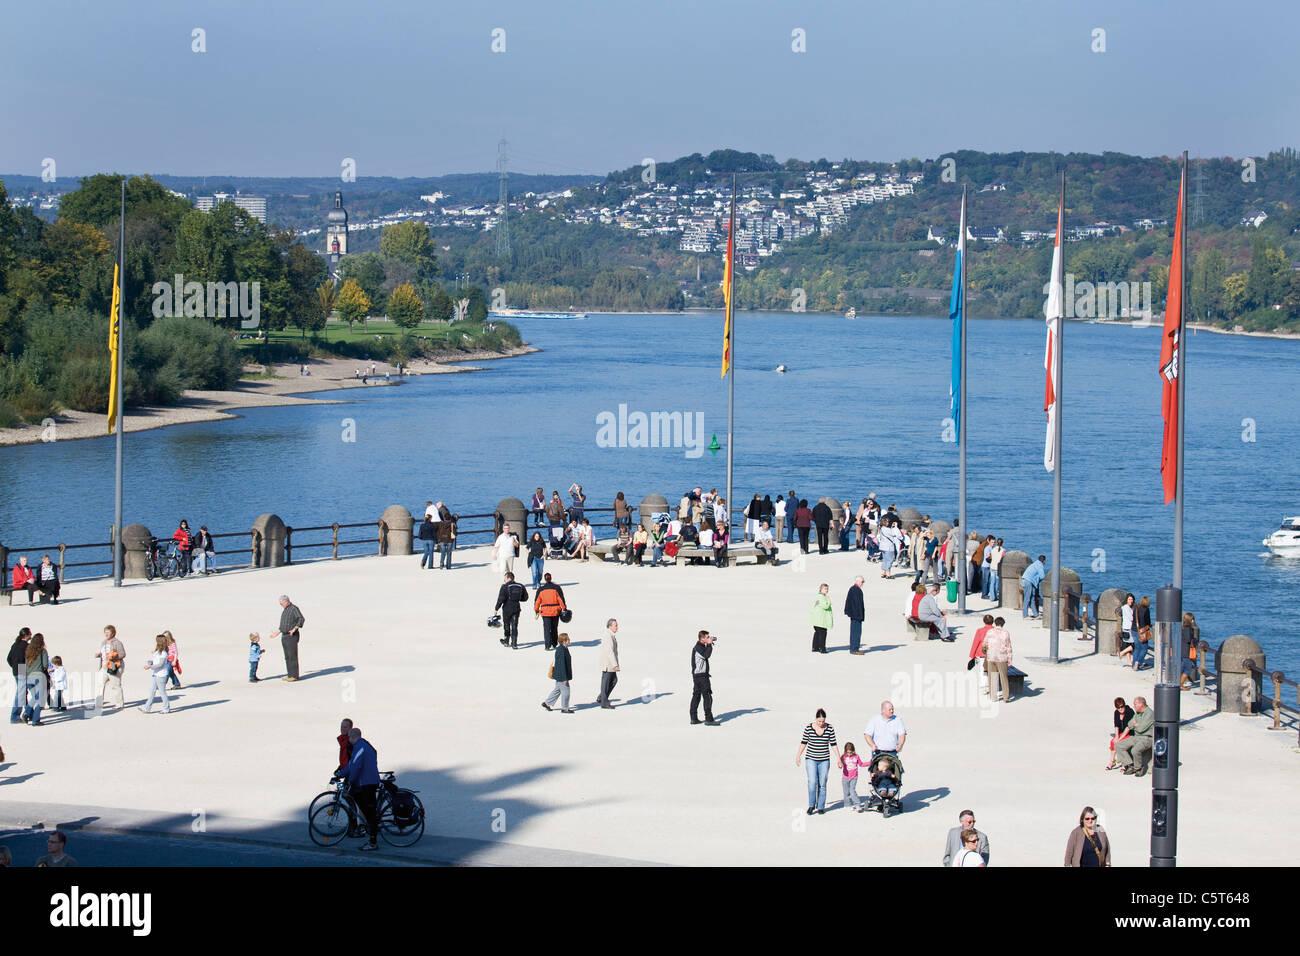 Germany, Rhineland-Palatinate, Koblenz, Deutsches Eck - Stock Image